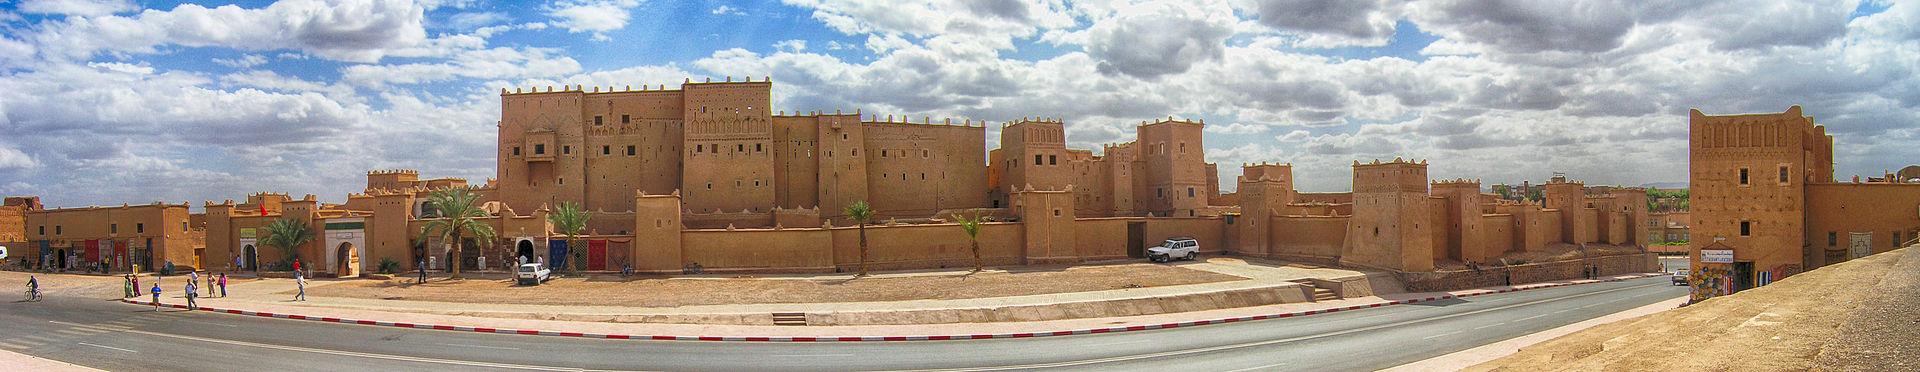 Panorama_of_Taourirt_Kasbah,_Ouarzazate,_Morocco.jpg